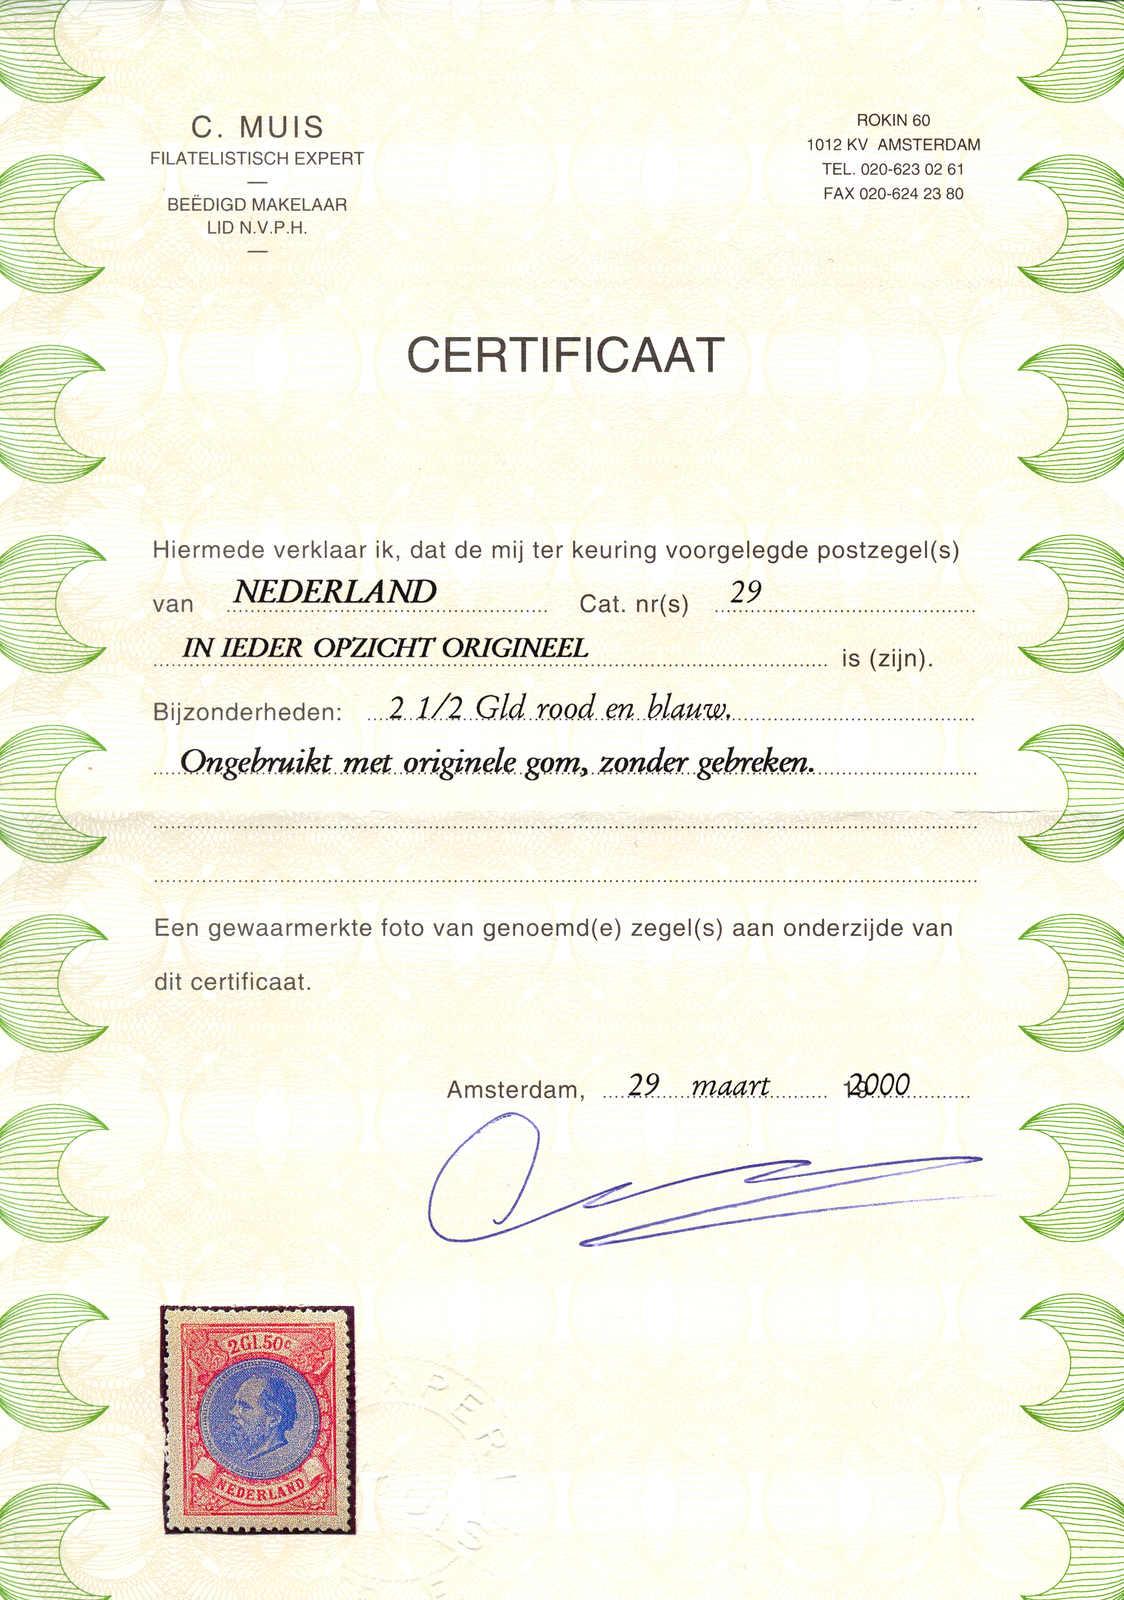 Lot 10140 - europe Netherlands -  classicphil GmbH 3 rd classicphil Auction - VIENNA- AUSTRIA